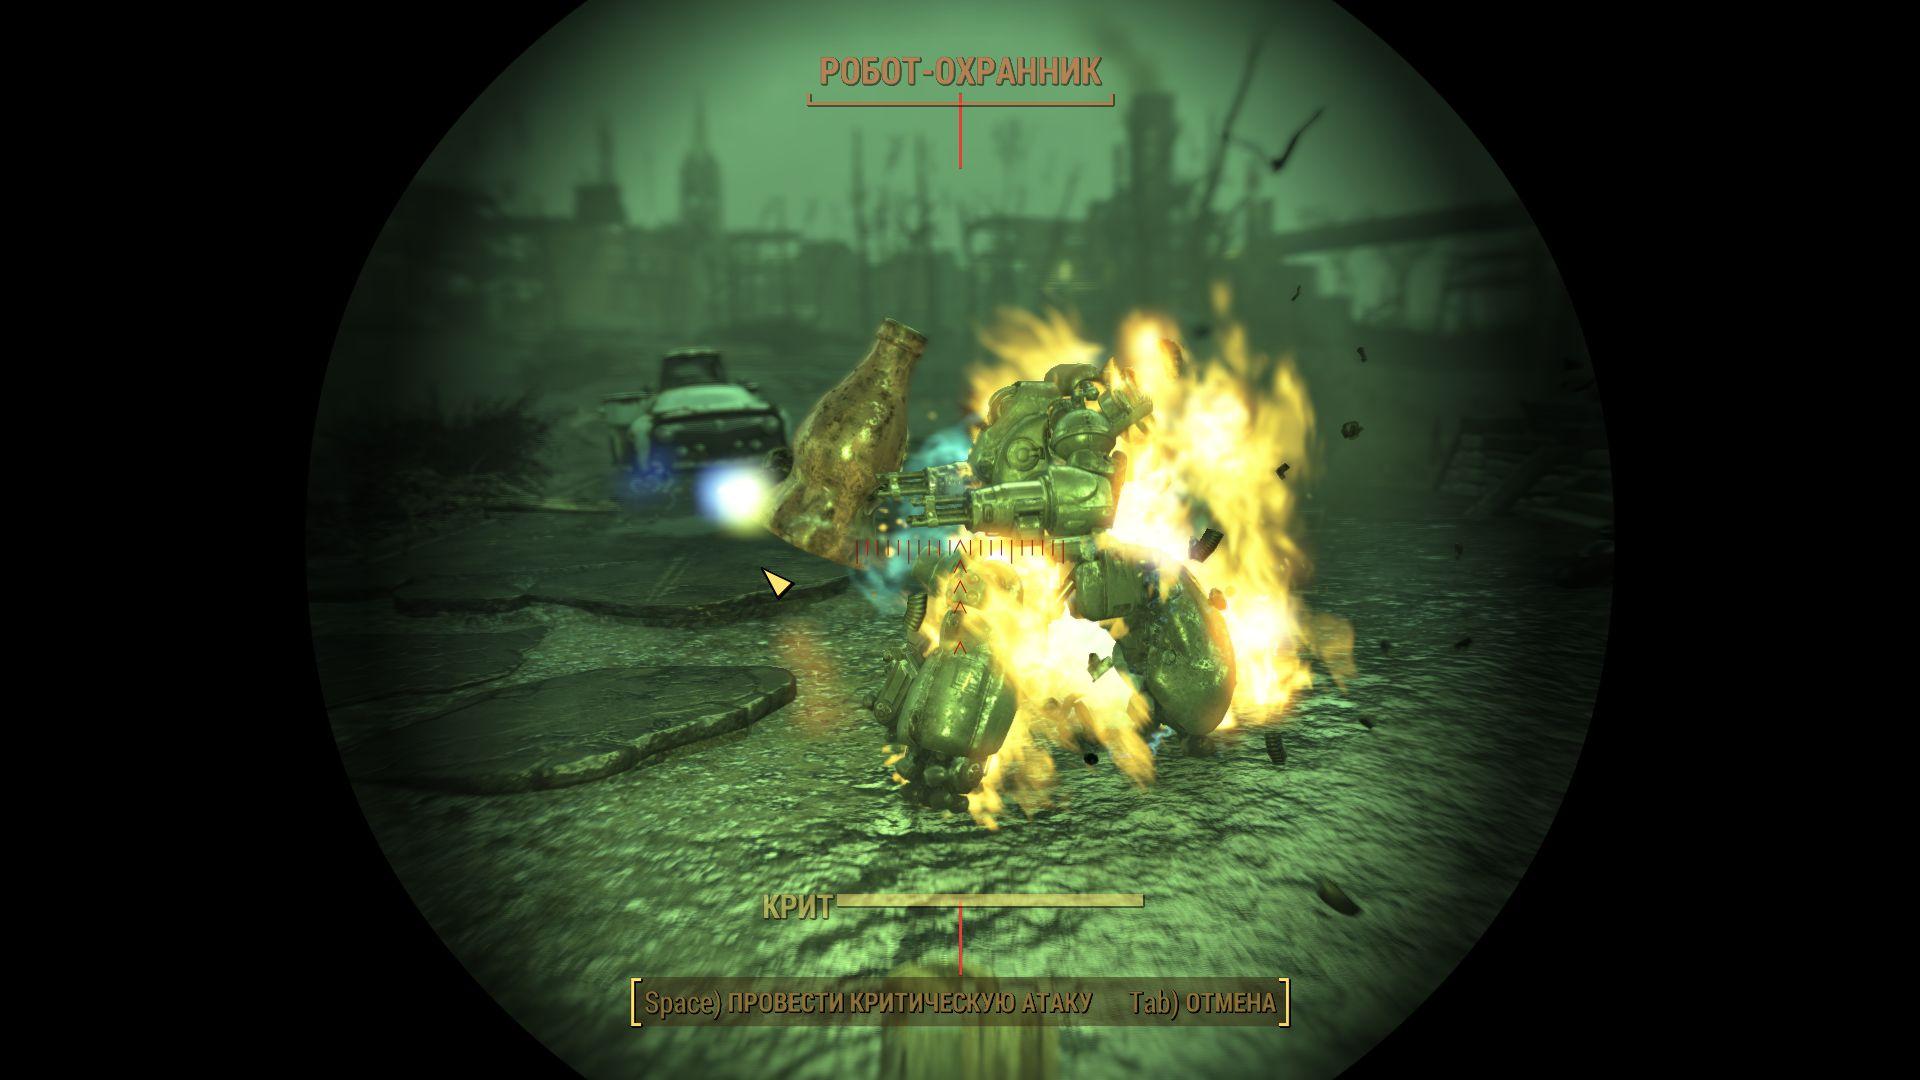 Сейчас взорвется!! - Fallout 4 робот-охранник